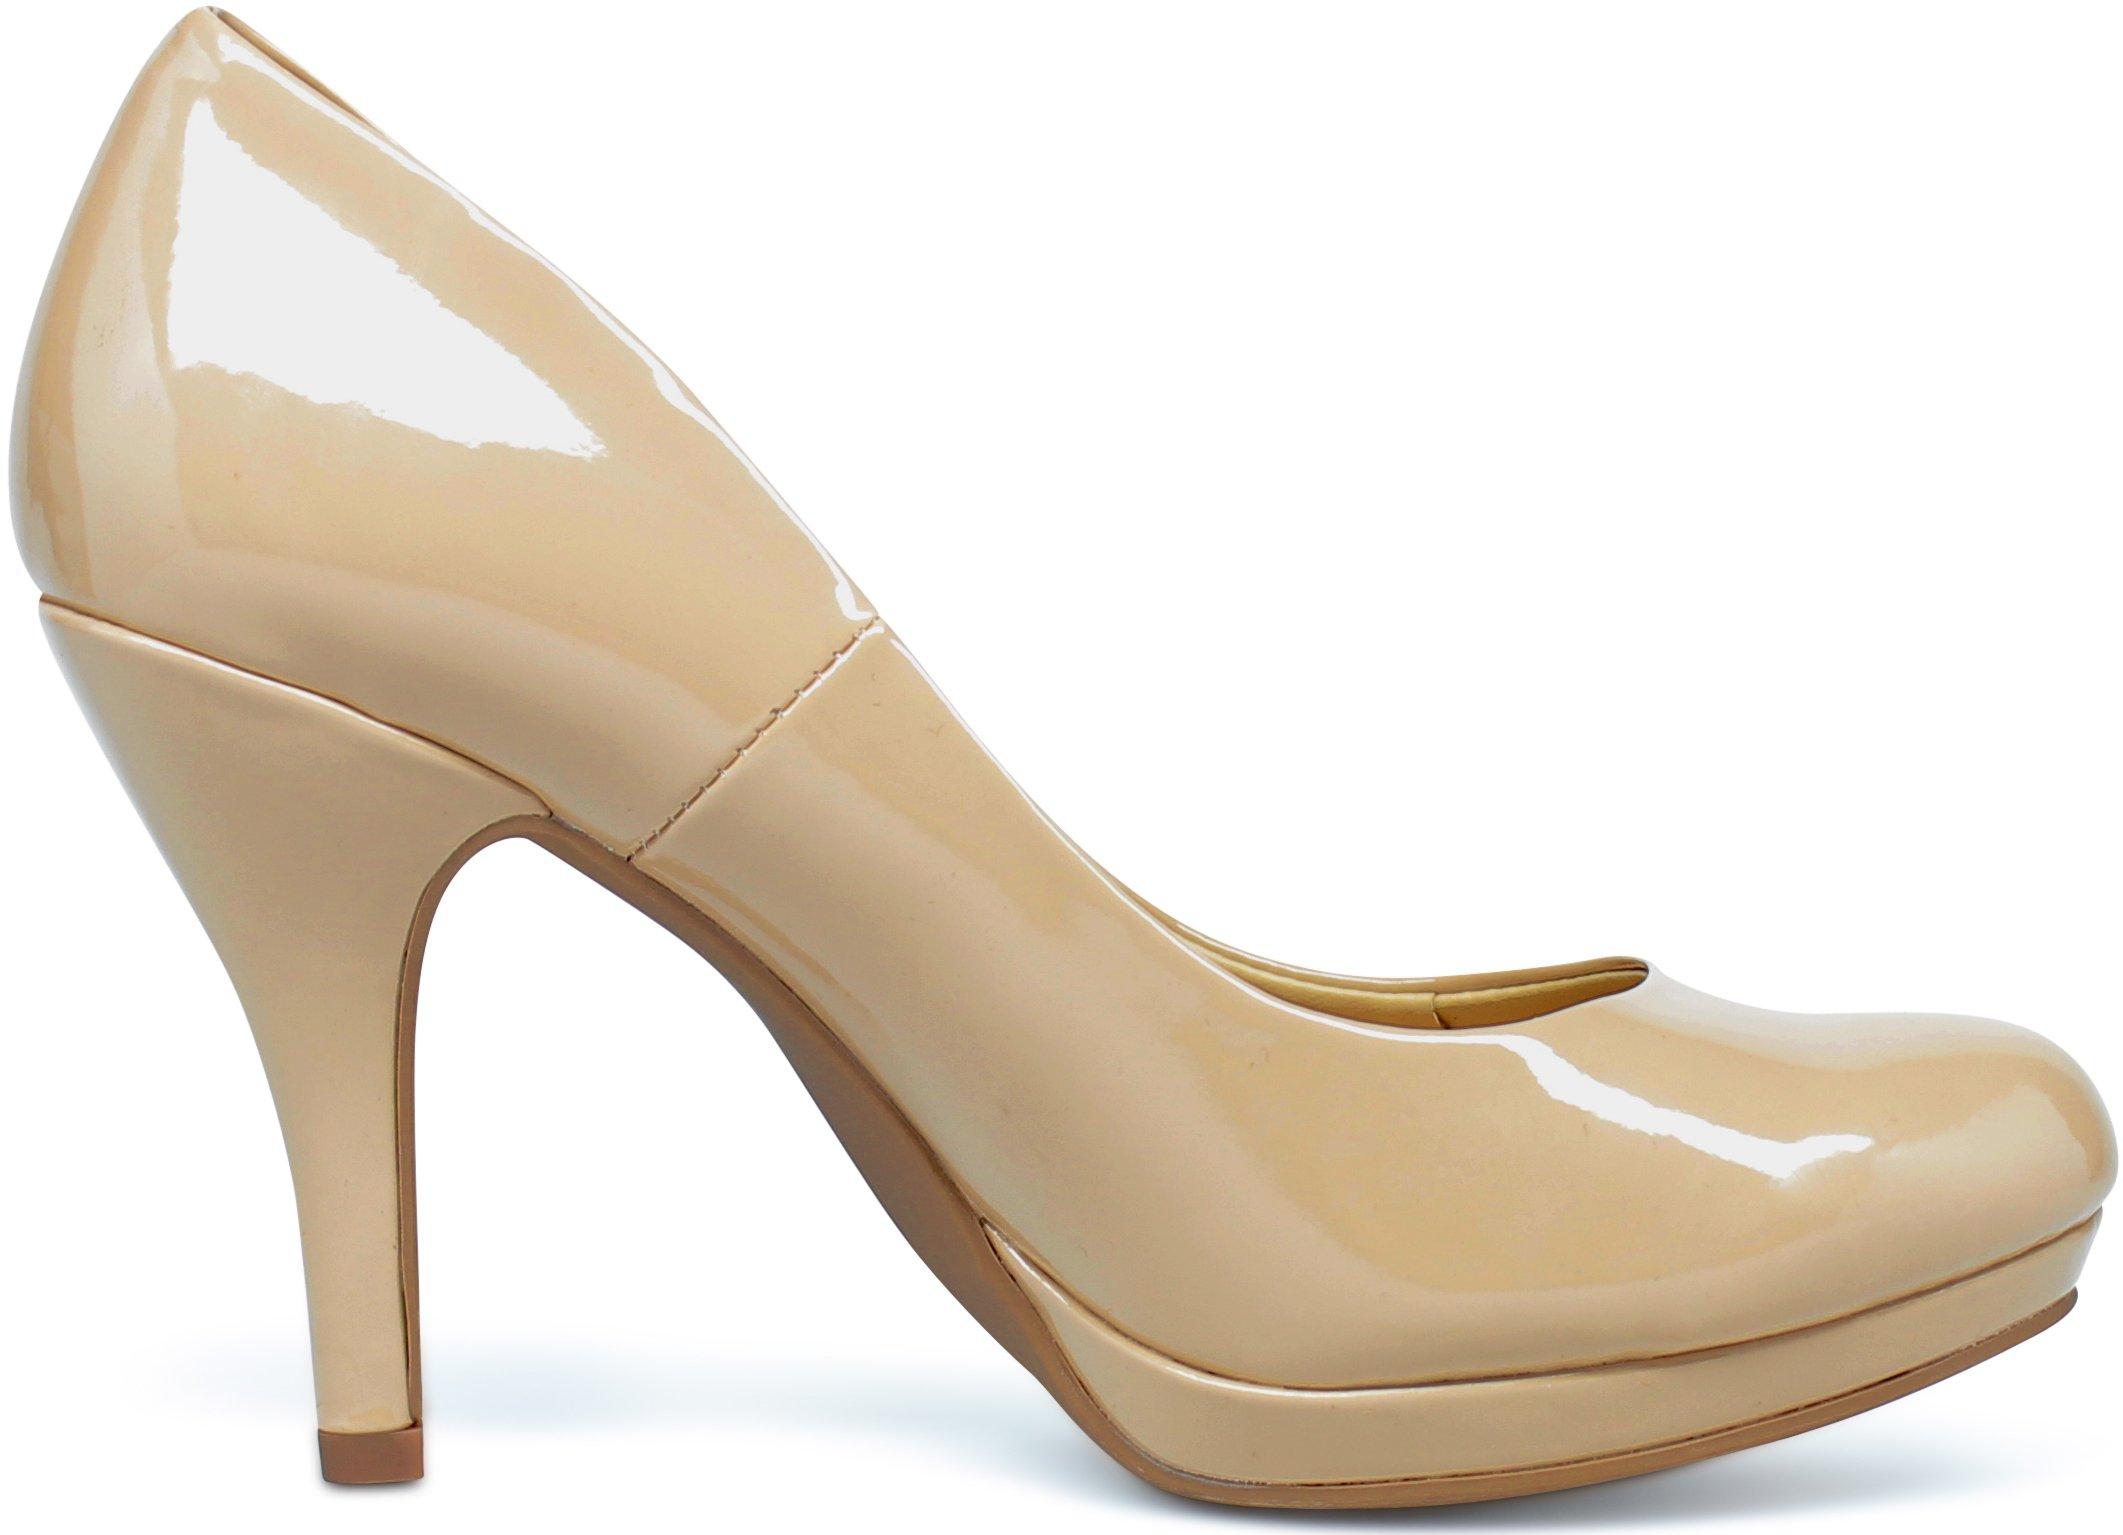 MARCOREPUBLIC Rome Memory Foam Cushion Womens Low Platform Heels Comfort Pumps - (Dark Beige Patent) - 7